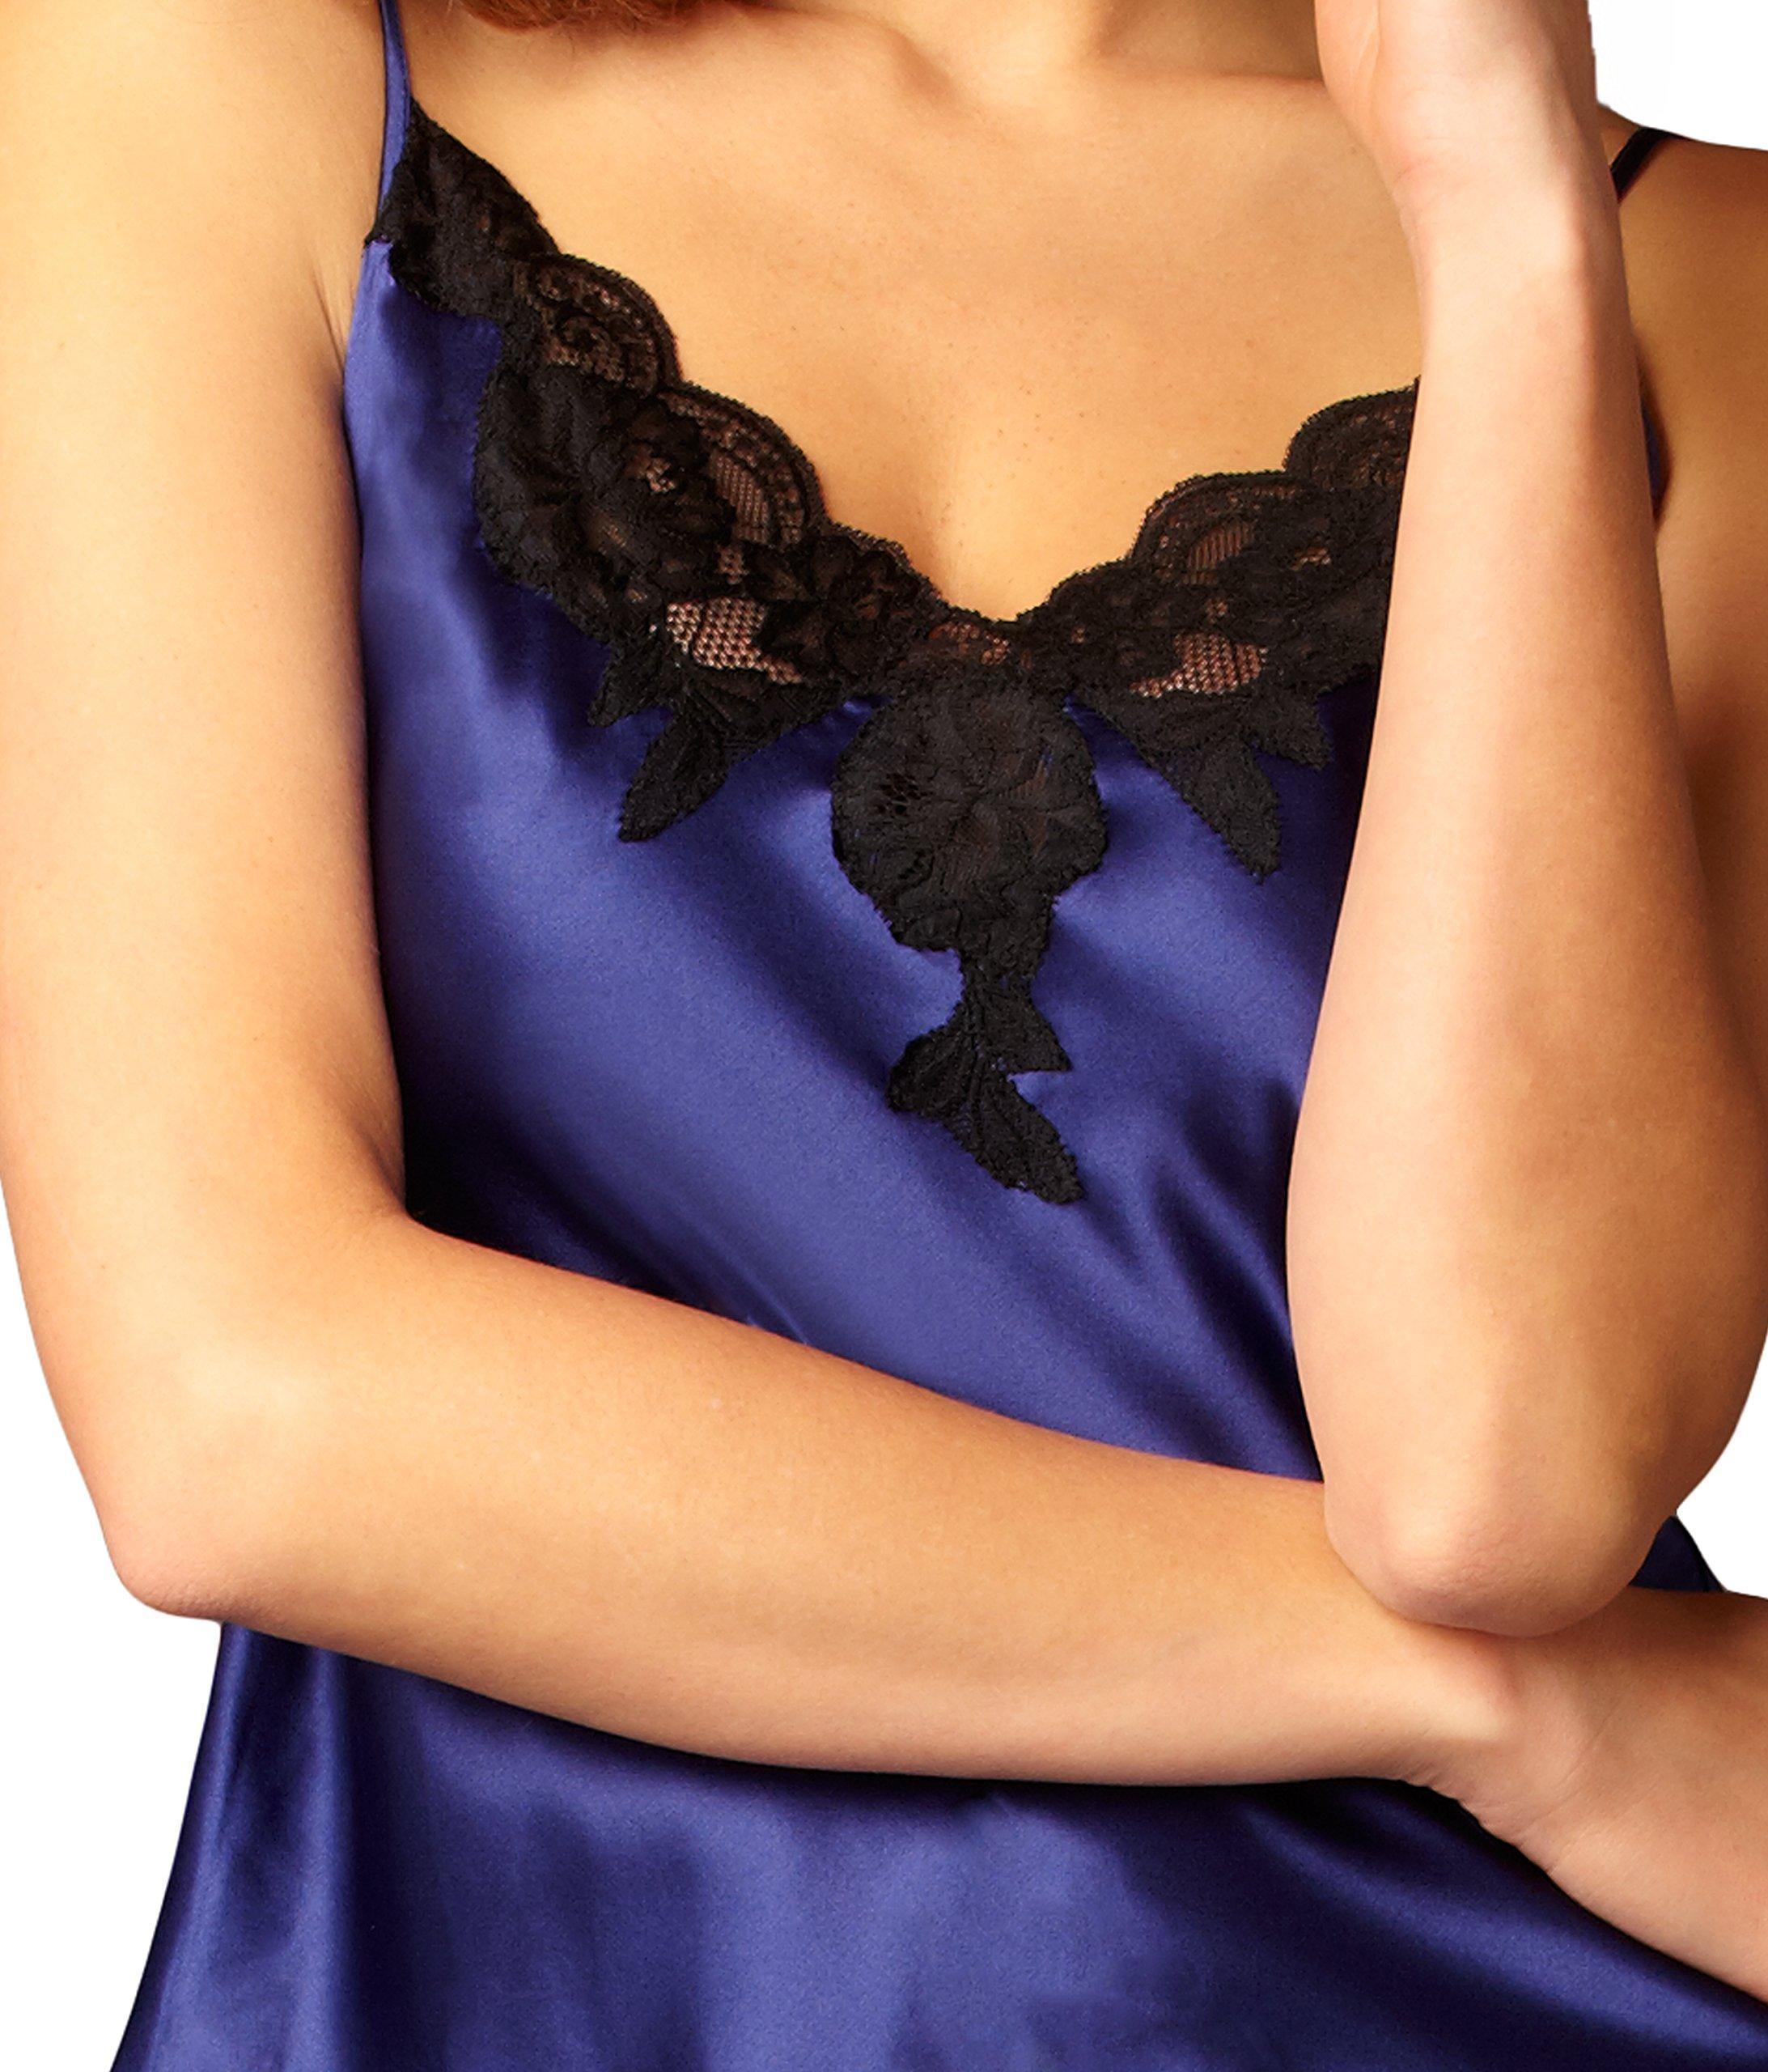 Julianna Rae Women's 100% Silk Contrast Cami Top, Lace Trim, Flattering Fit, Le Tresor Collection, Parisian, M by Julianna Rae (Image #2)